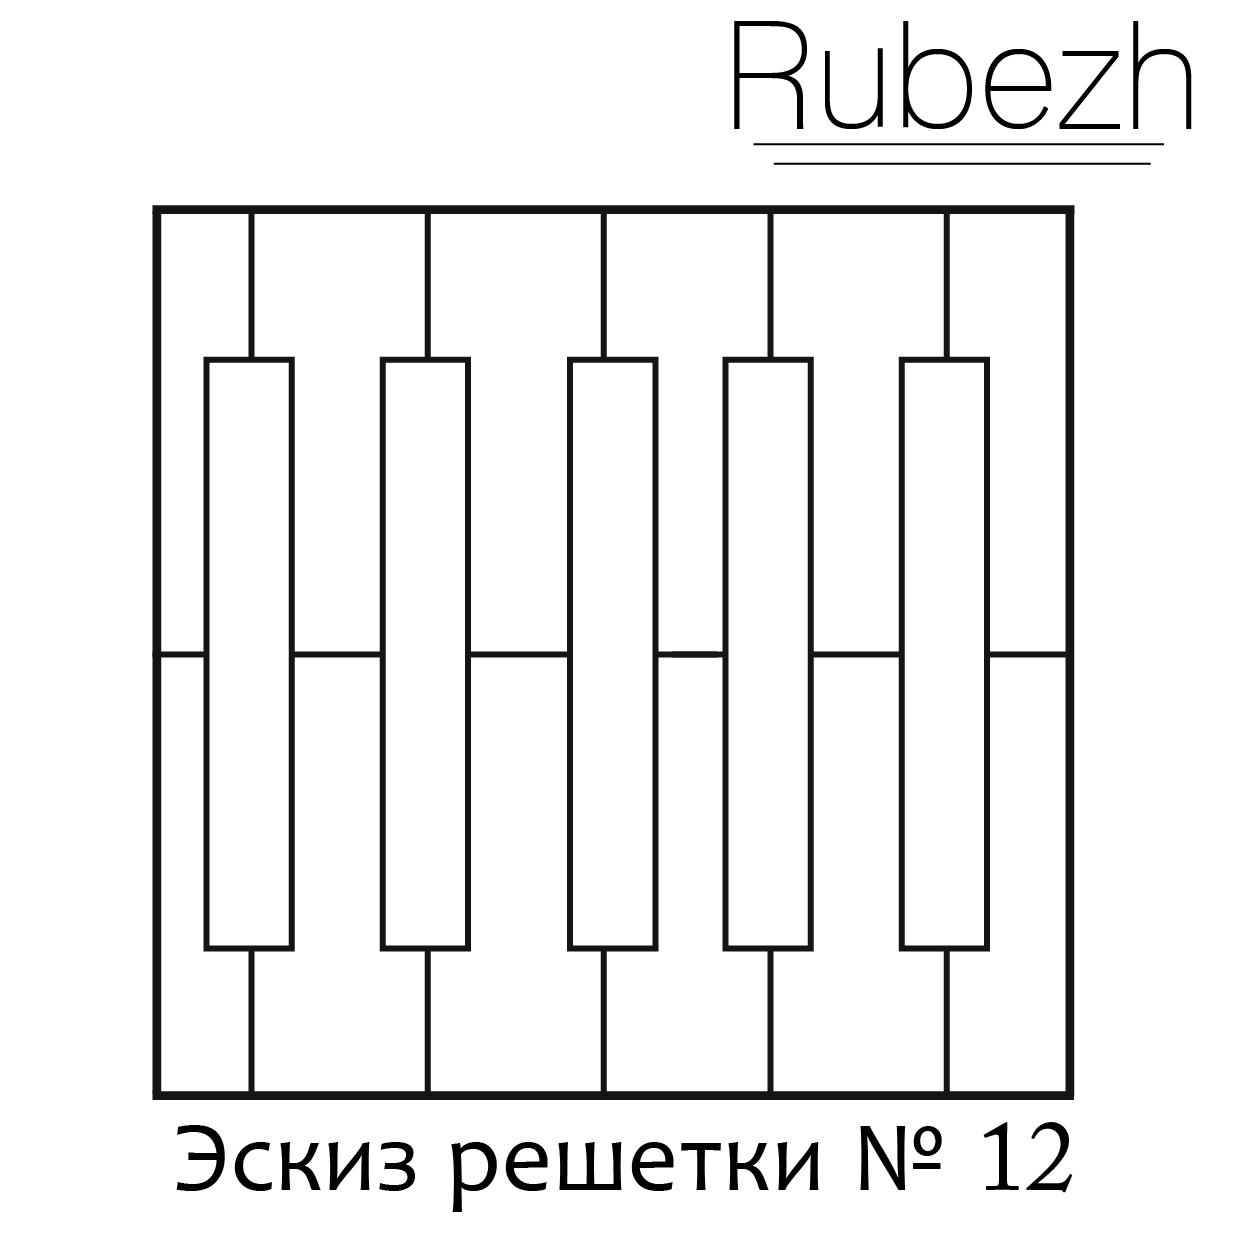 Эскиз решетки № 12